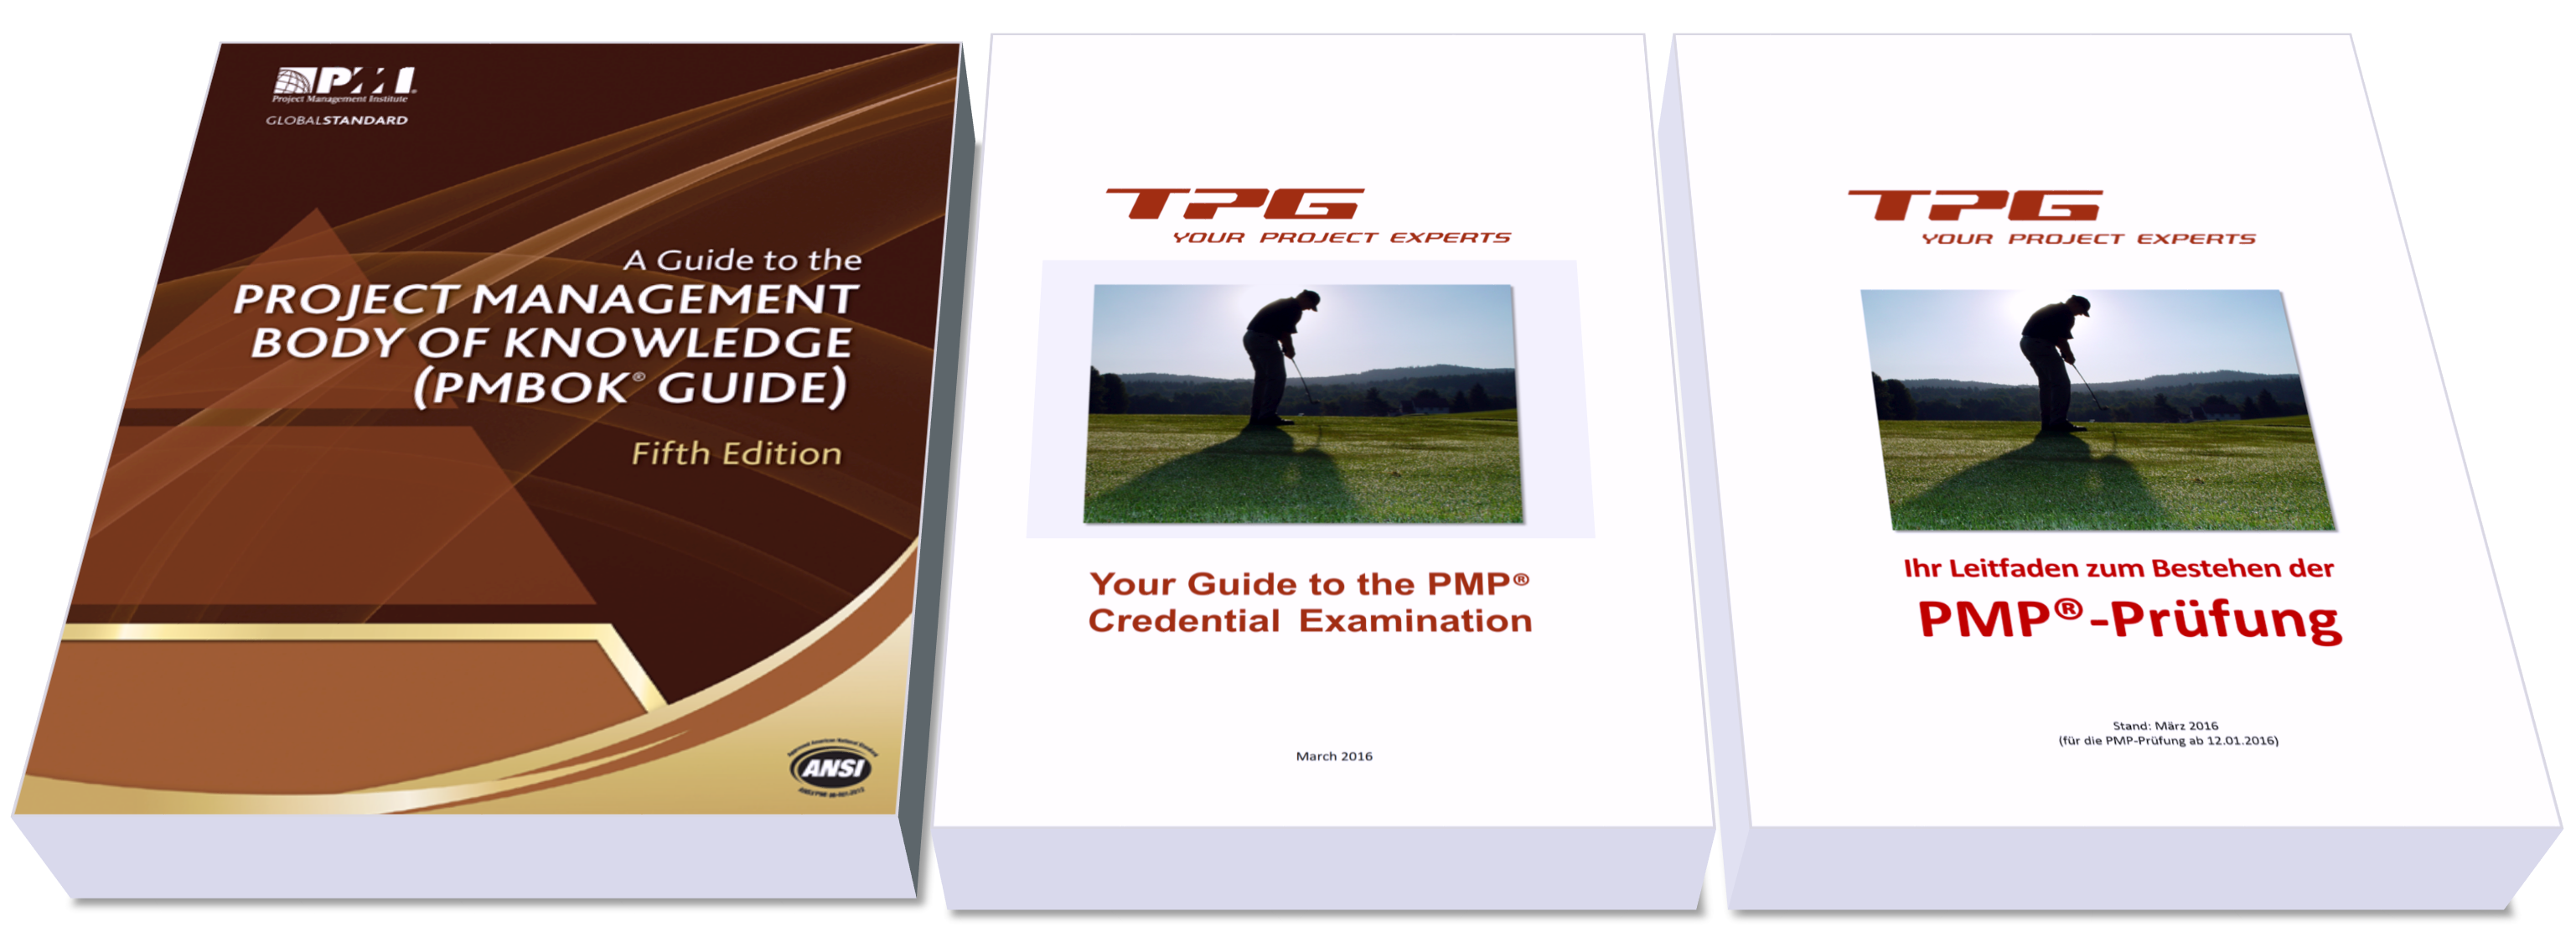 PMBOK Guide + Handouts: PMP-Zertifizierung im internationalen Umfeld